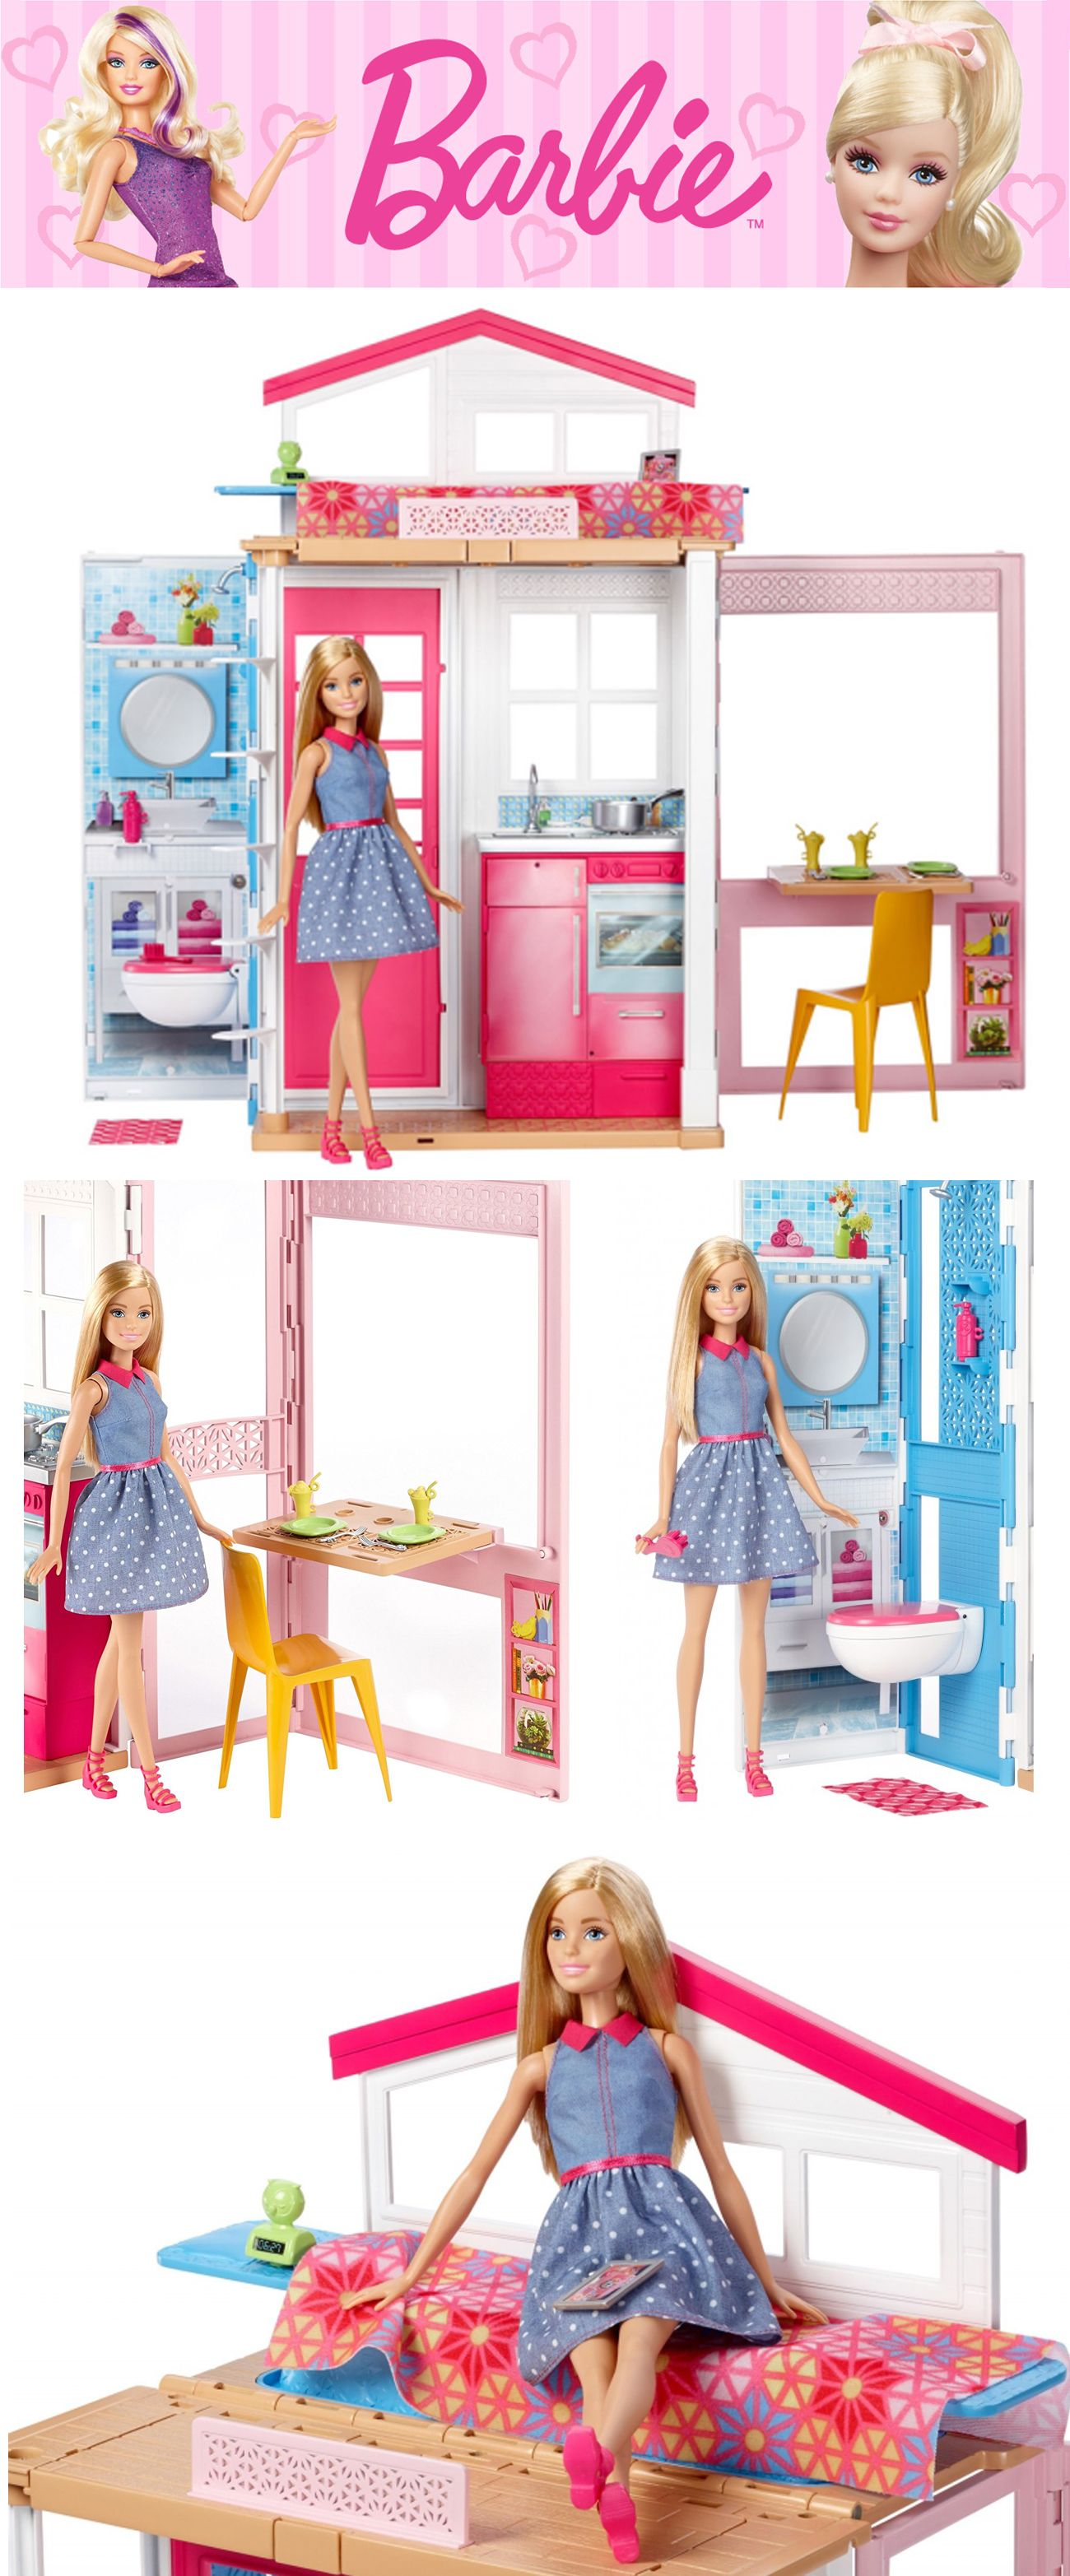 Barbie Dwupoziomowy Domek Dla Lalek Dvv48 Gratis With Images